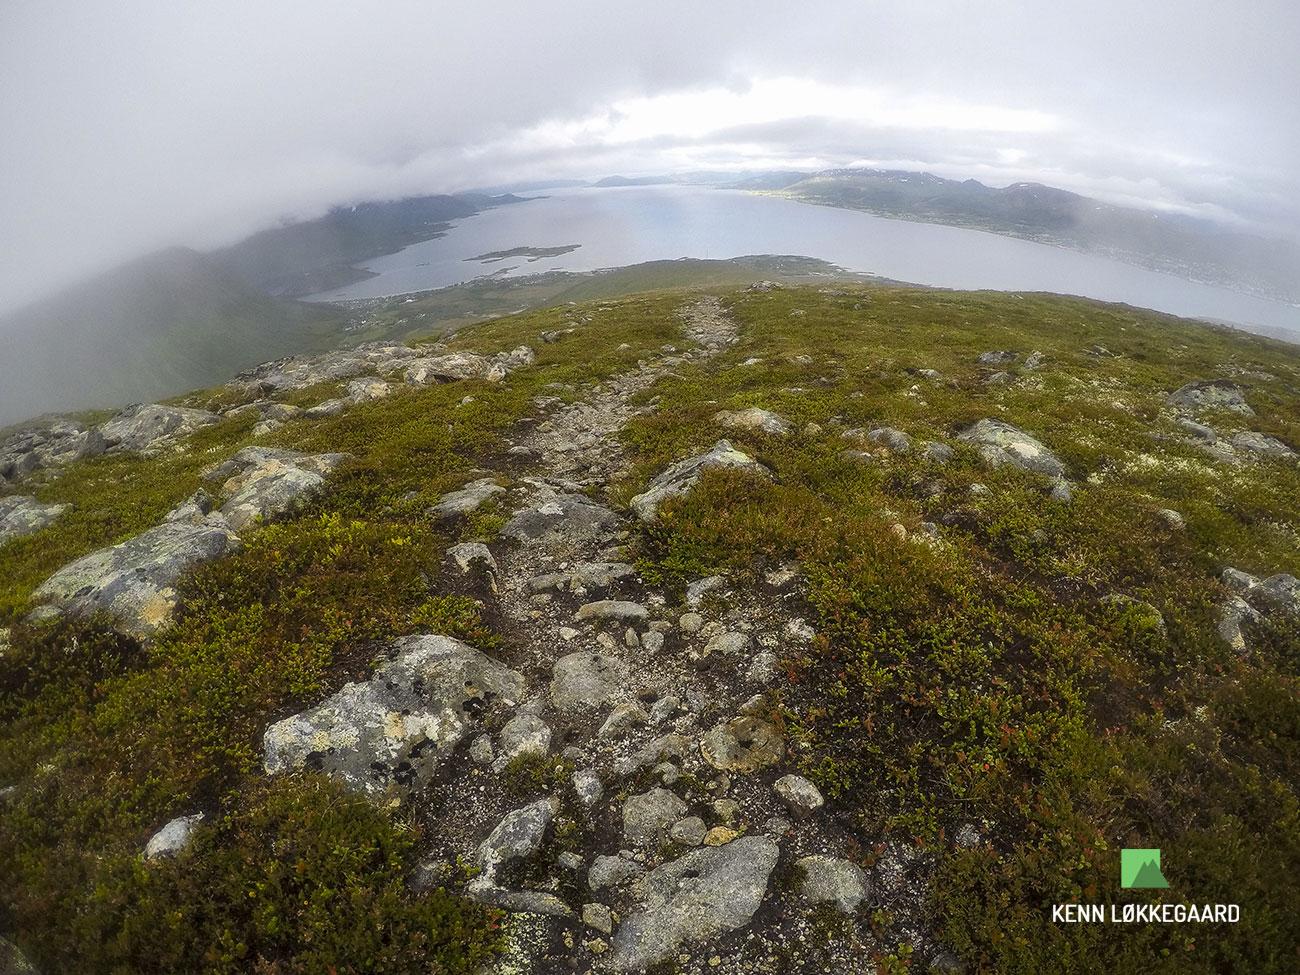 Blåheia-trailløb-tåge-sti-ned